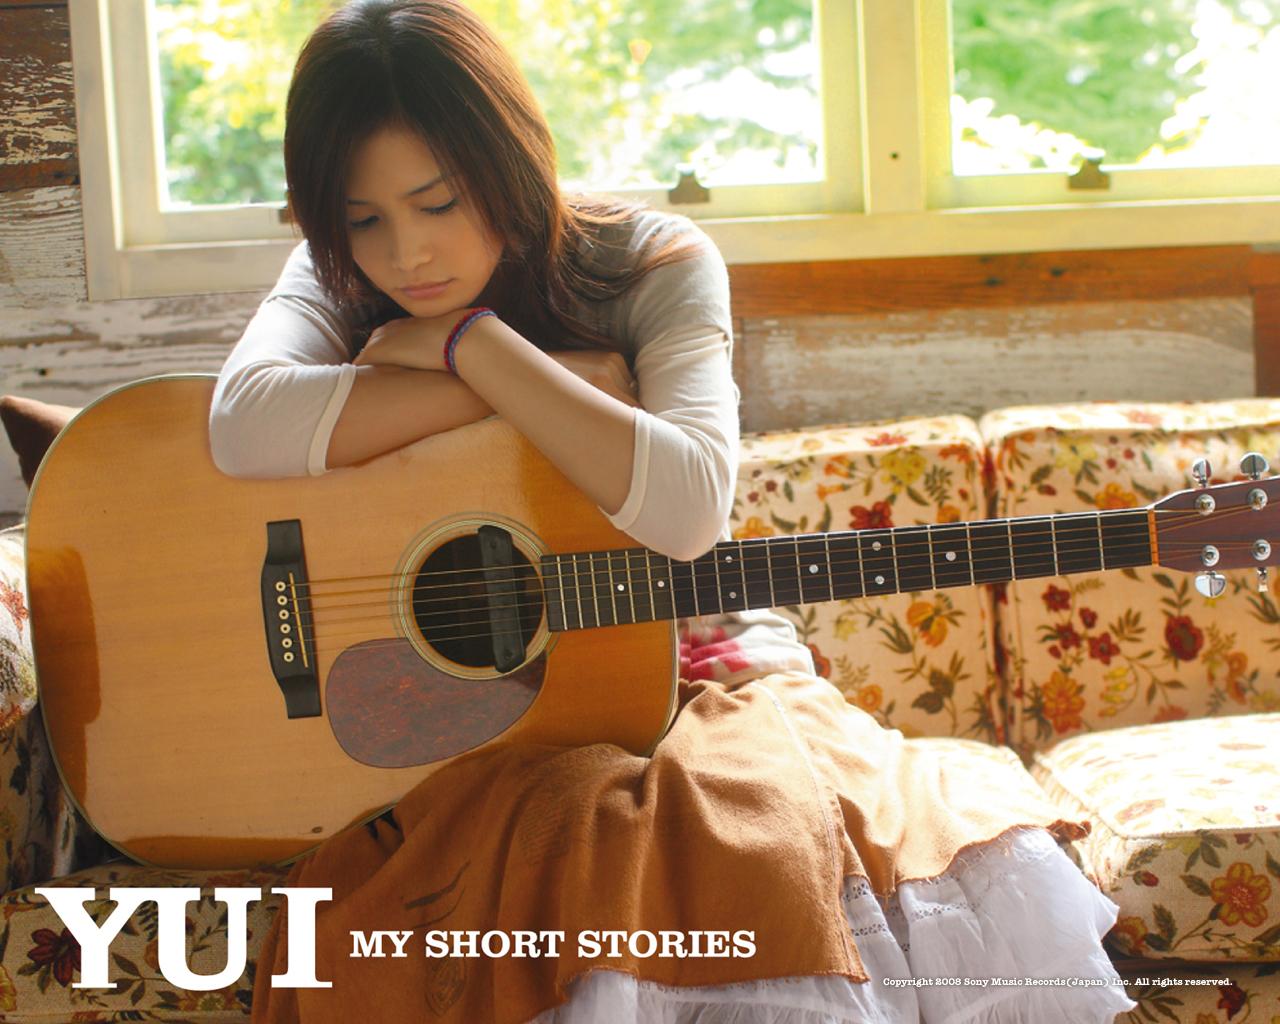 http://2.bp.blogspot.com/_itJ4OFXKC3E/TUvudvoT36I/AAAAAAAAAIc/o070-srKcoc/s1600/yoshioka-yui-my-short-stories-limited-l.jpg